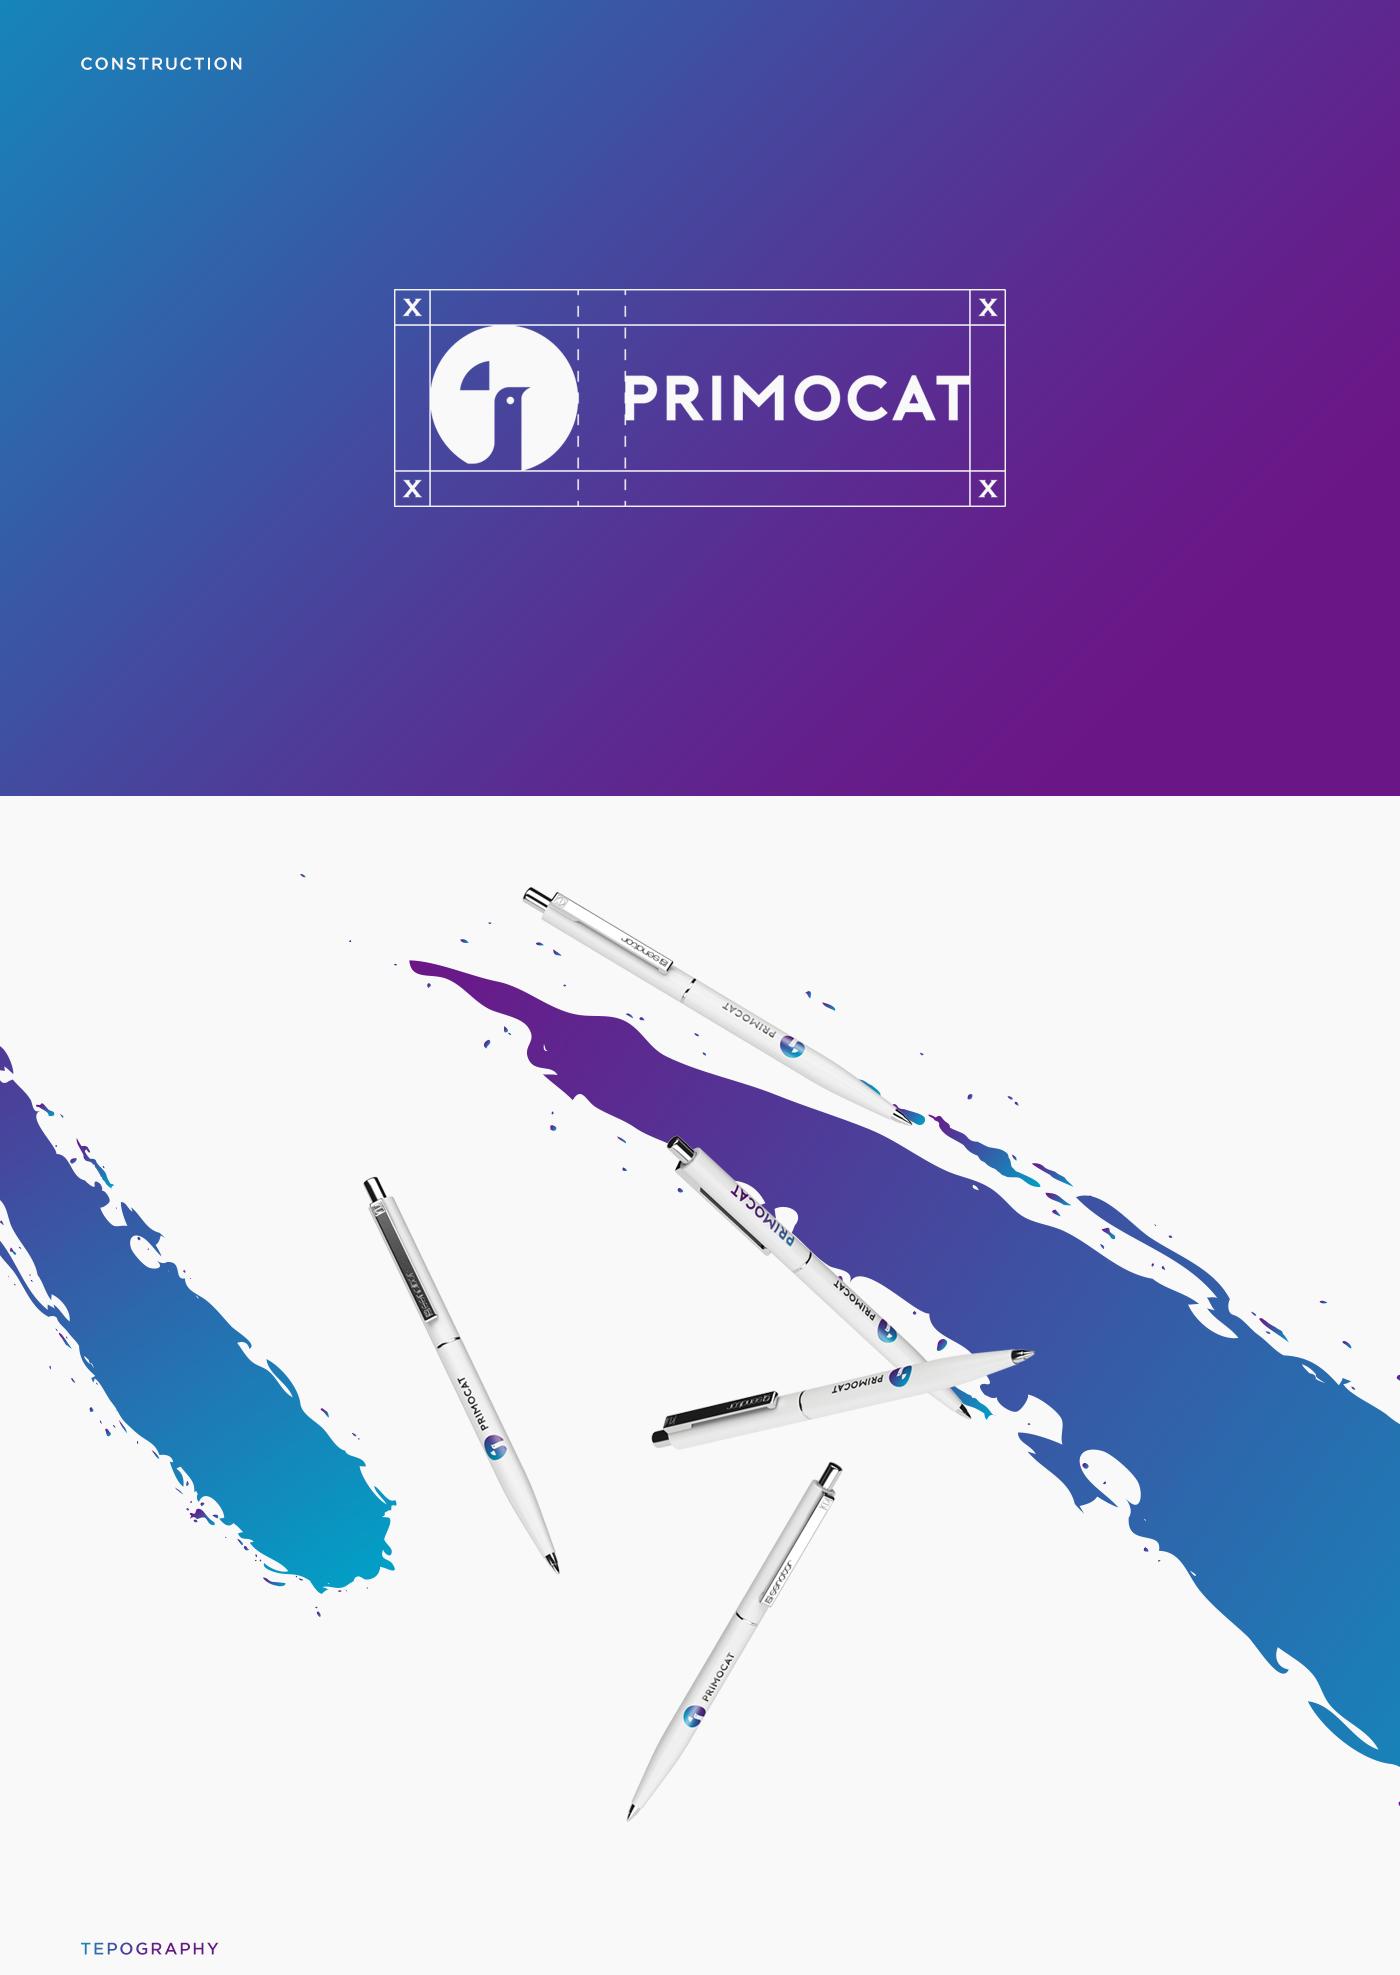 primocat brand logo design paint bucket company tcz BRANANDING